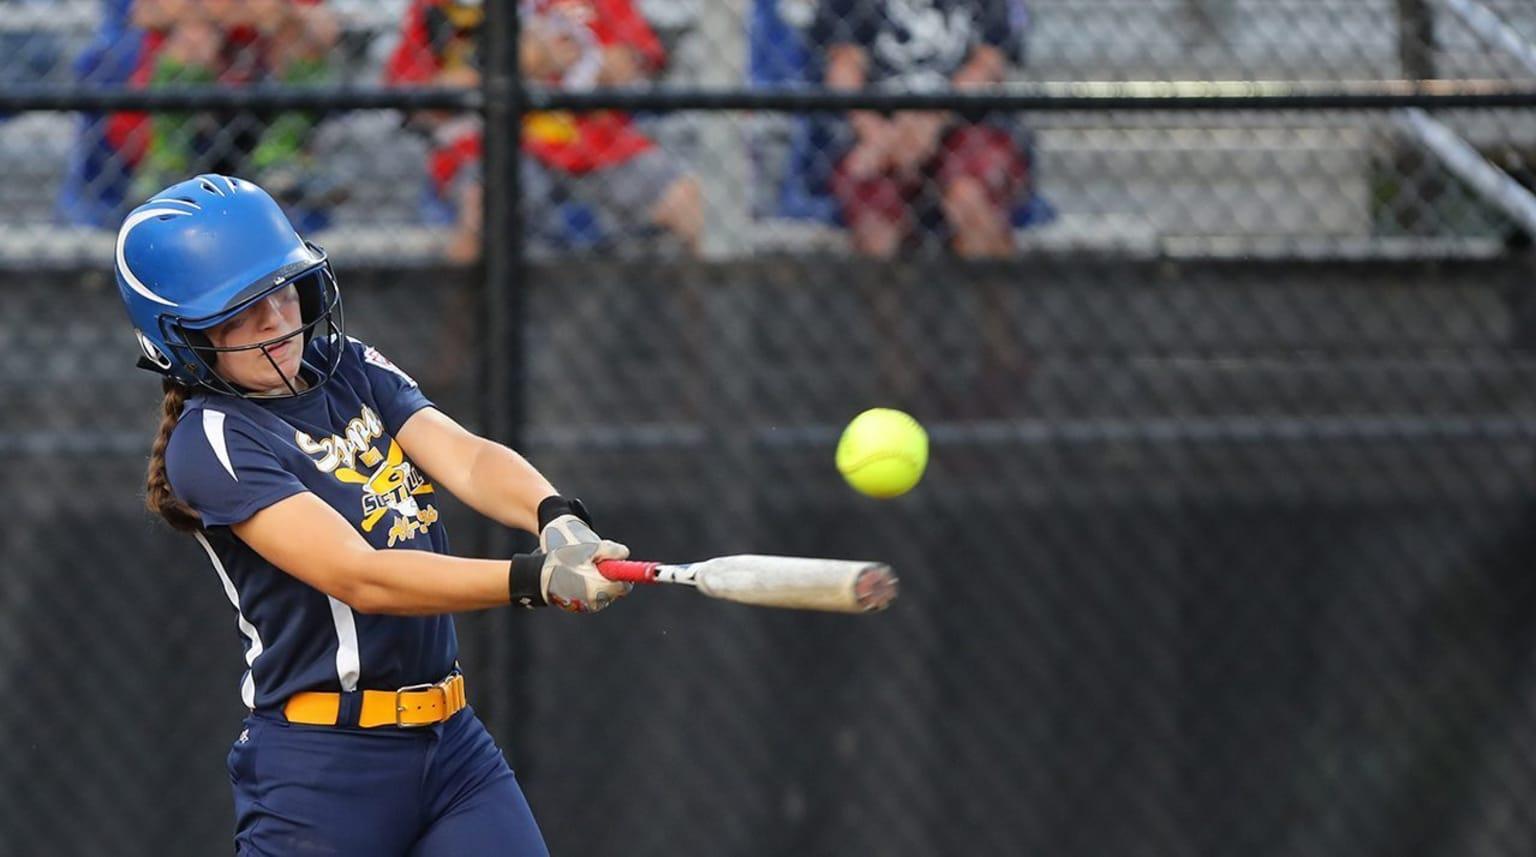 A softball batter swinging the bat